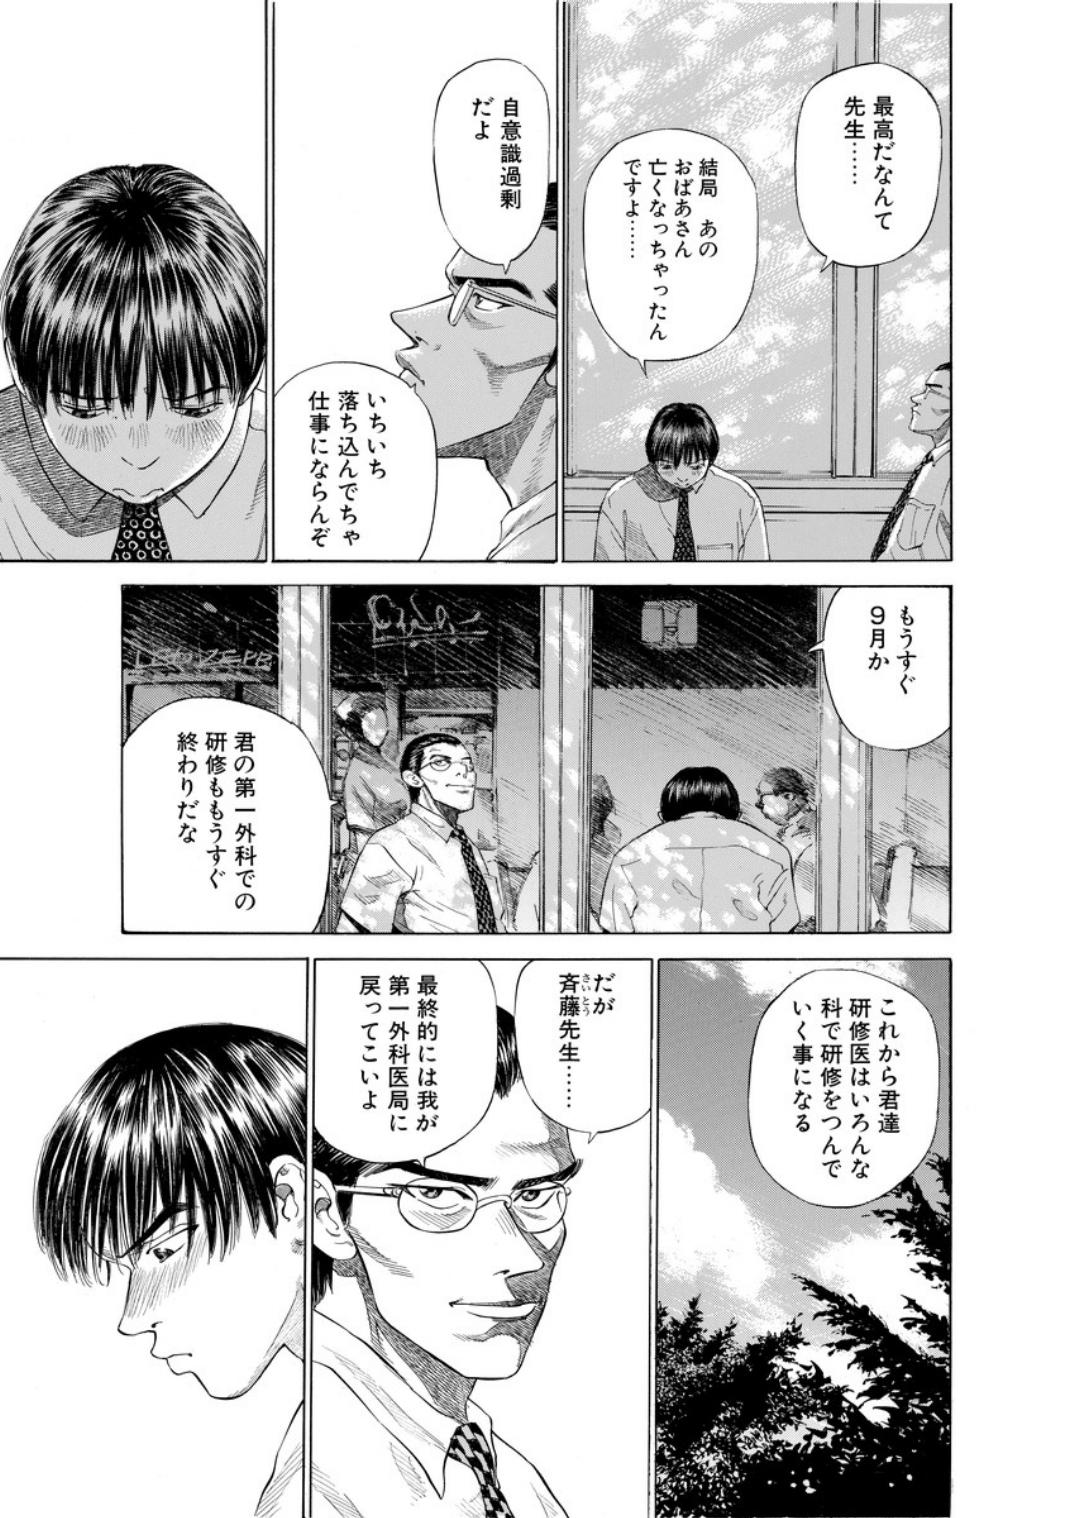 001bj_page-0159.jpg